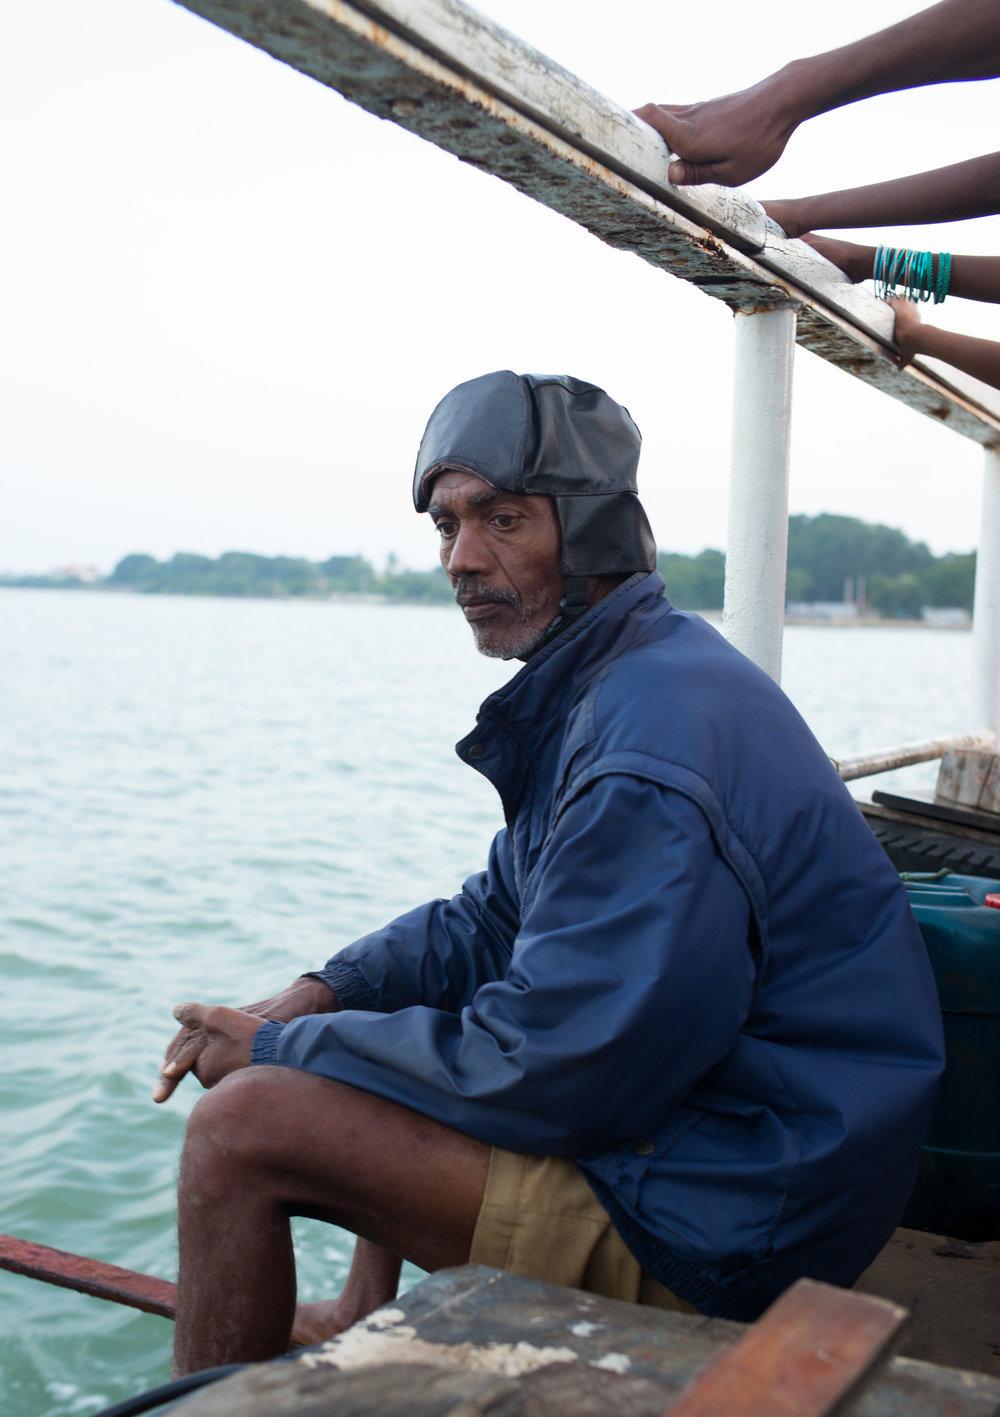 Boat driver, Northern Sri Lanka, 2018